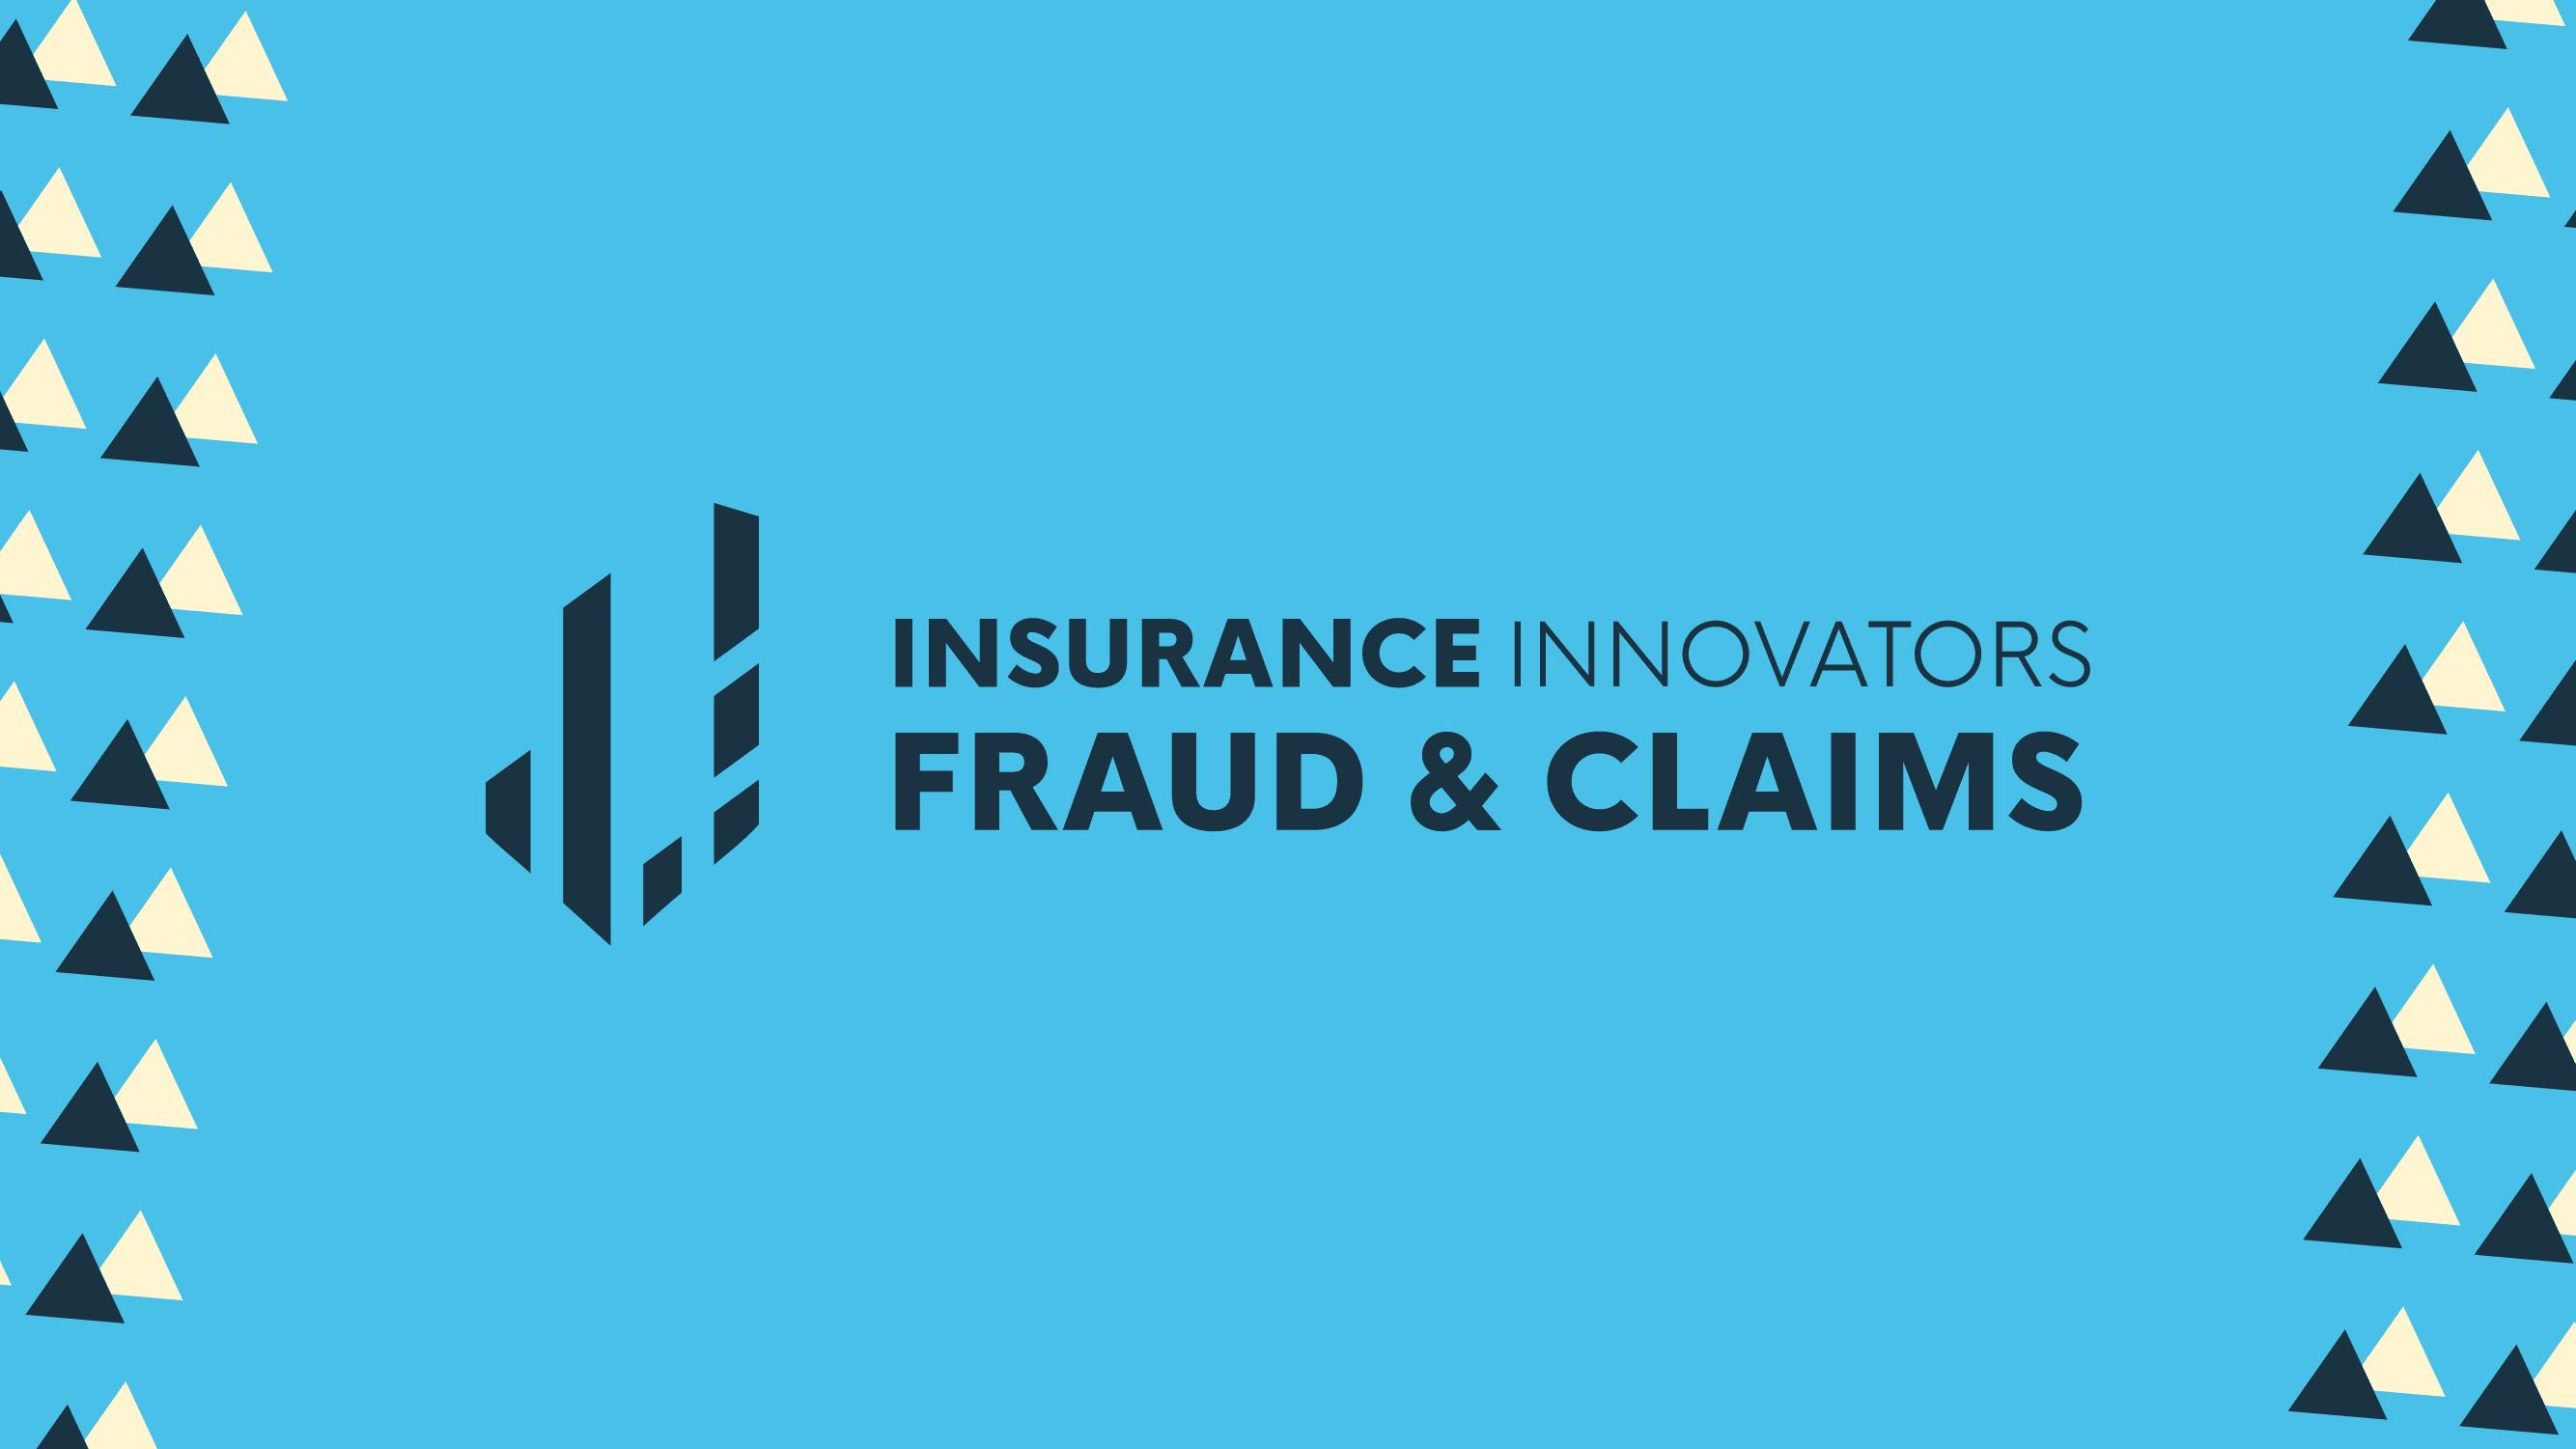 Insurance Innovators: Fraud & Claims | Insurance Innovators